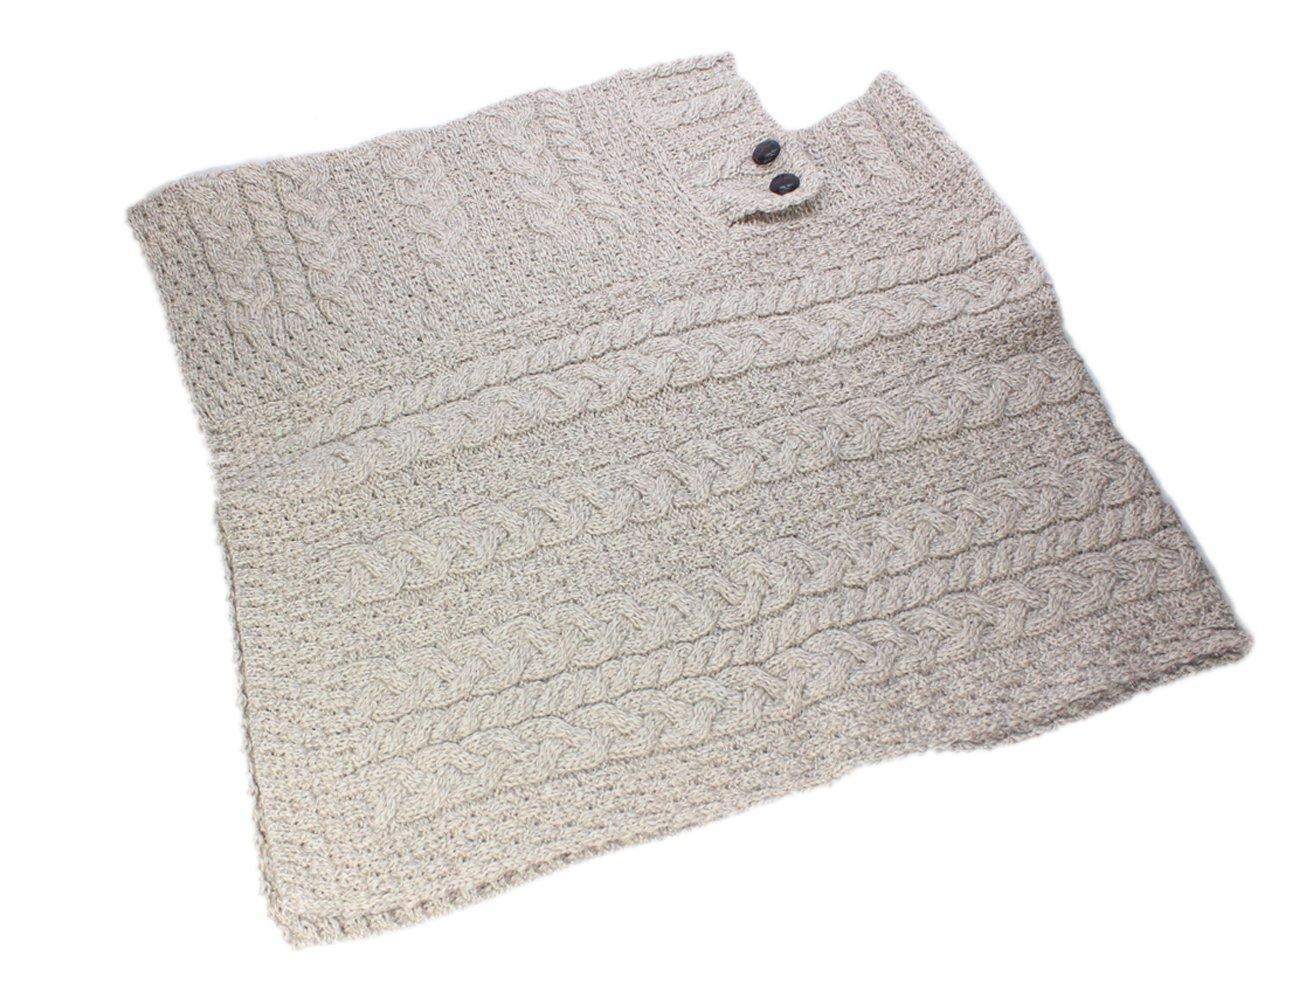 Fisherman Knit Poncho 100% Merino Wool Natural by Carraig Donn (Image #1)